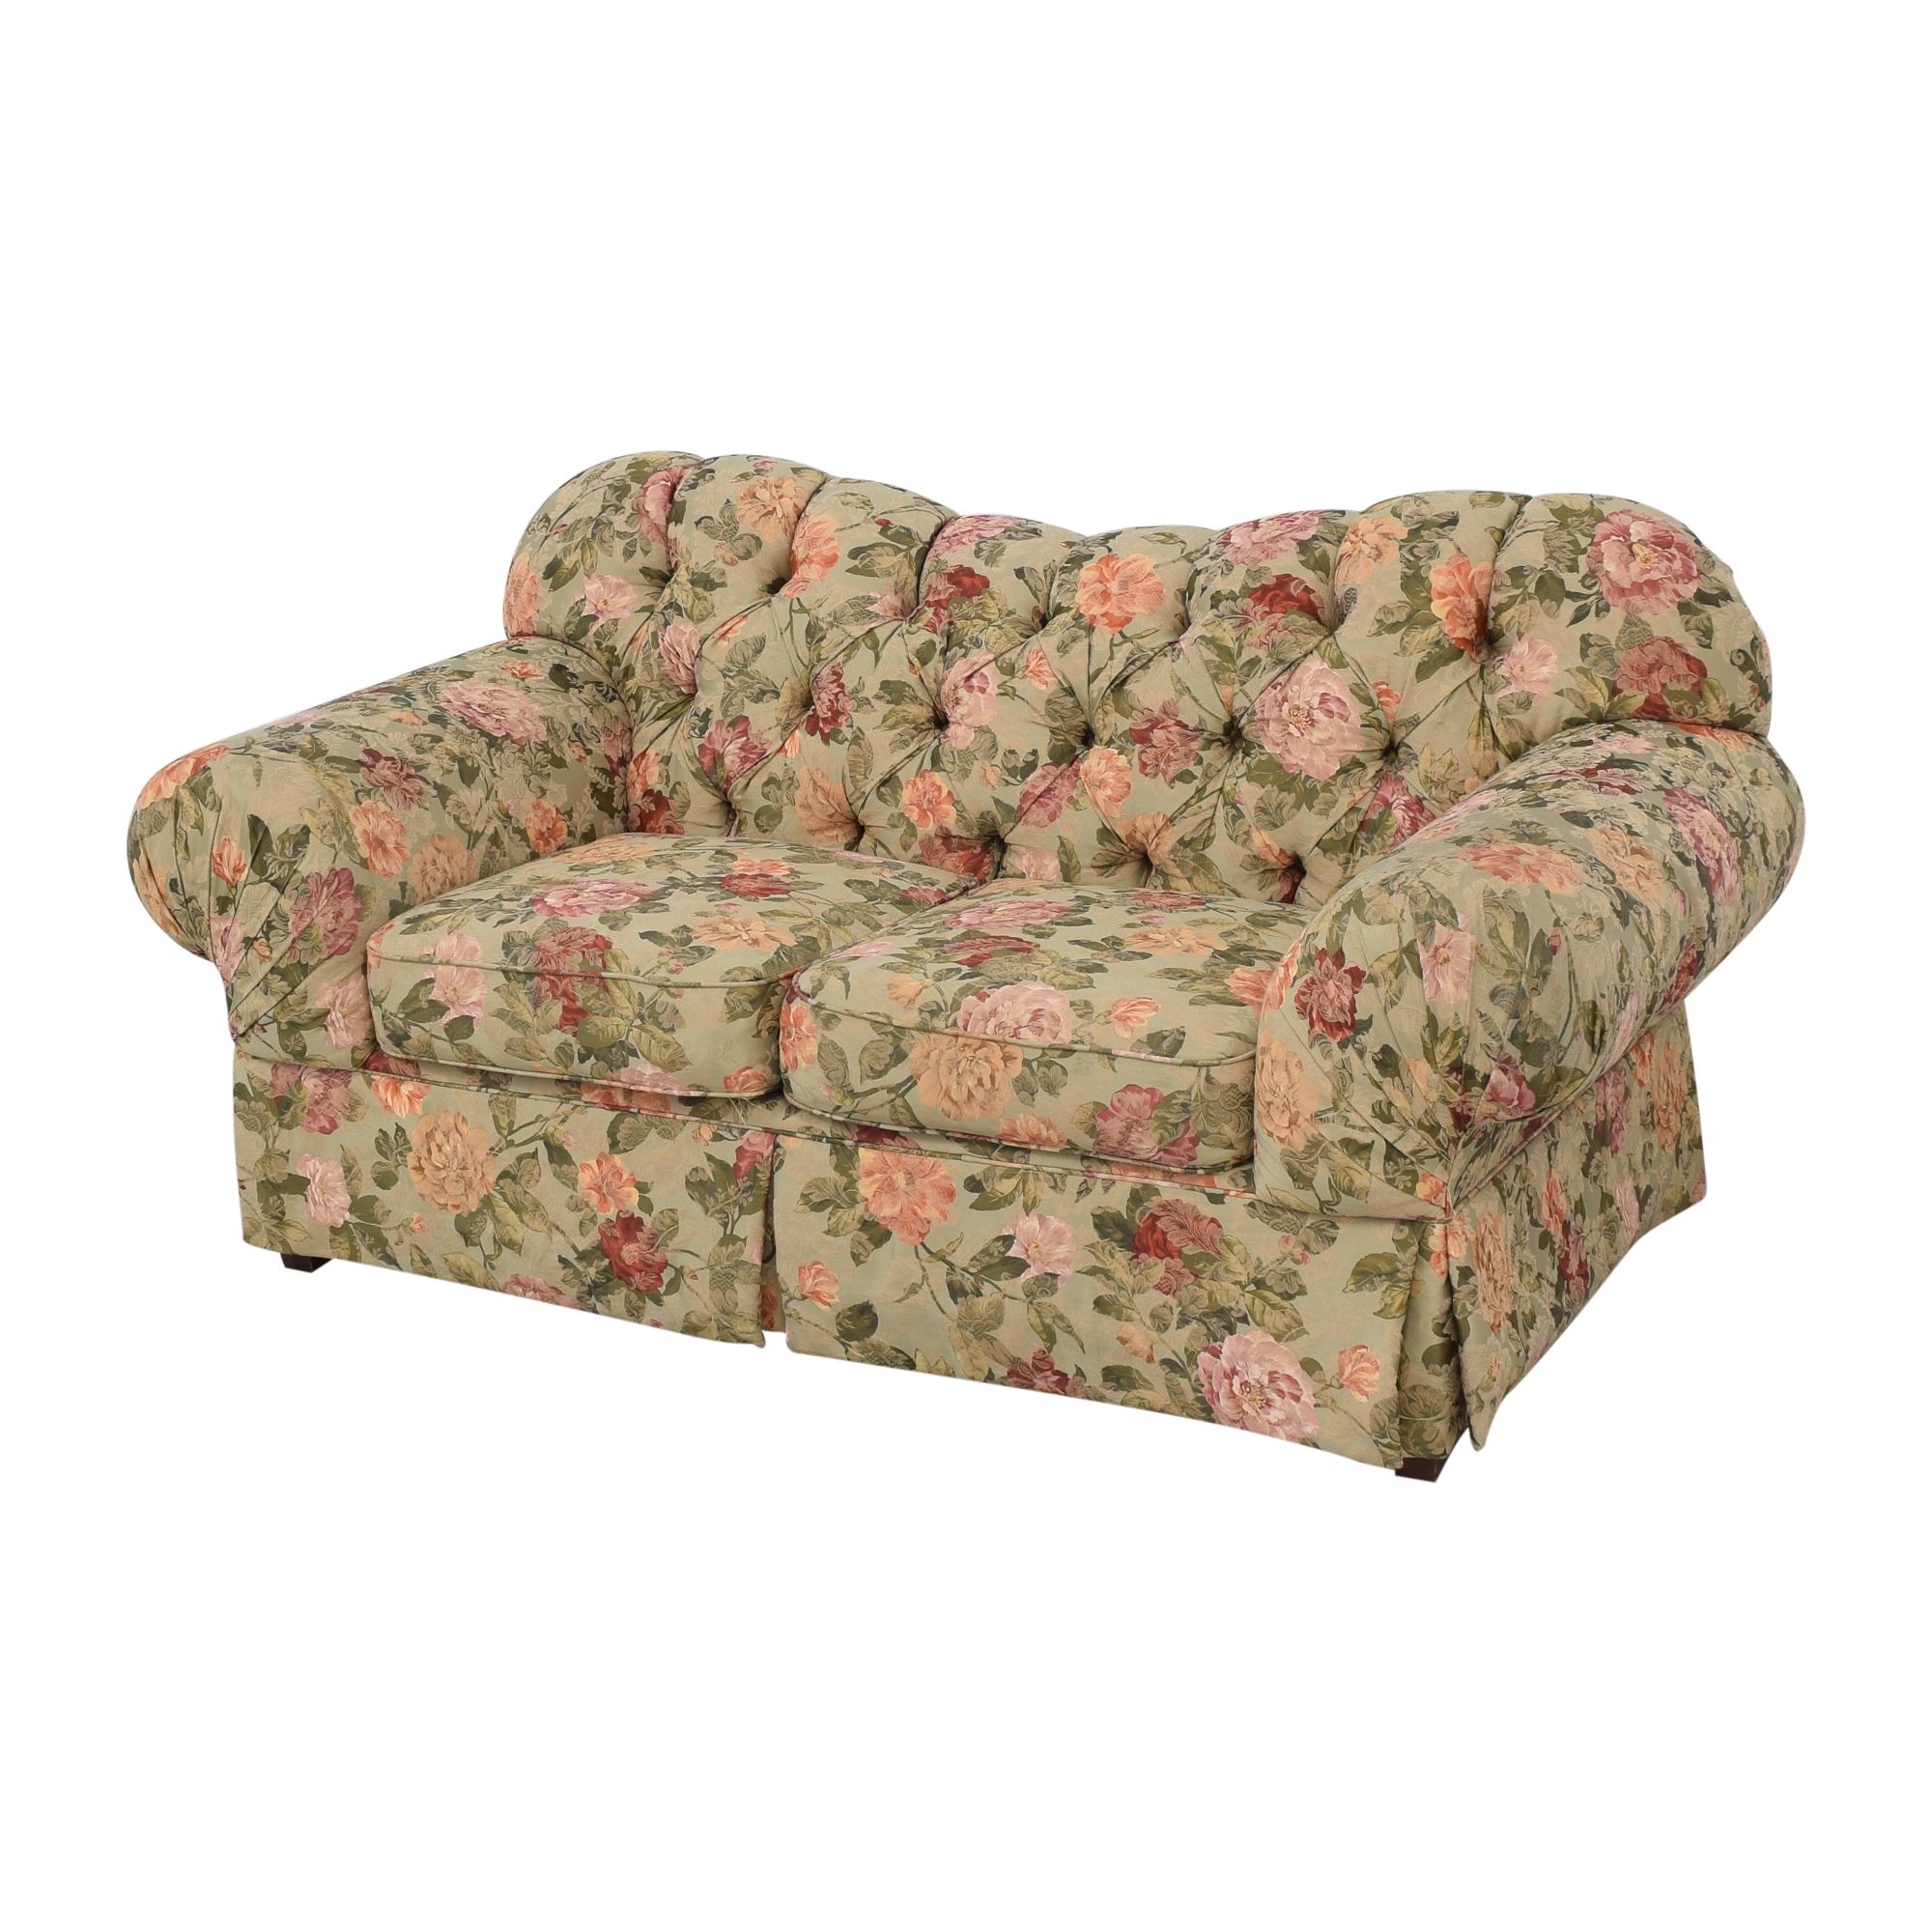 buy England Furniture Loveseat England Furniture Loveseats